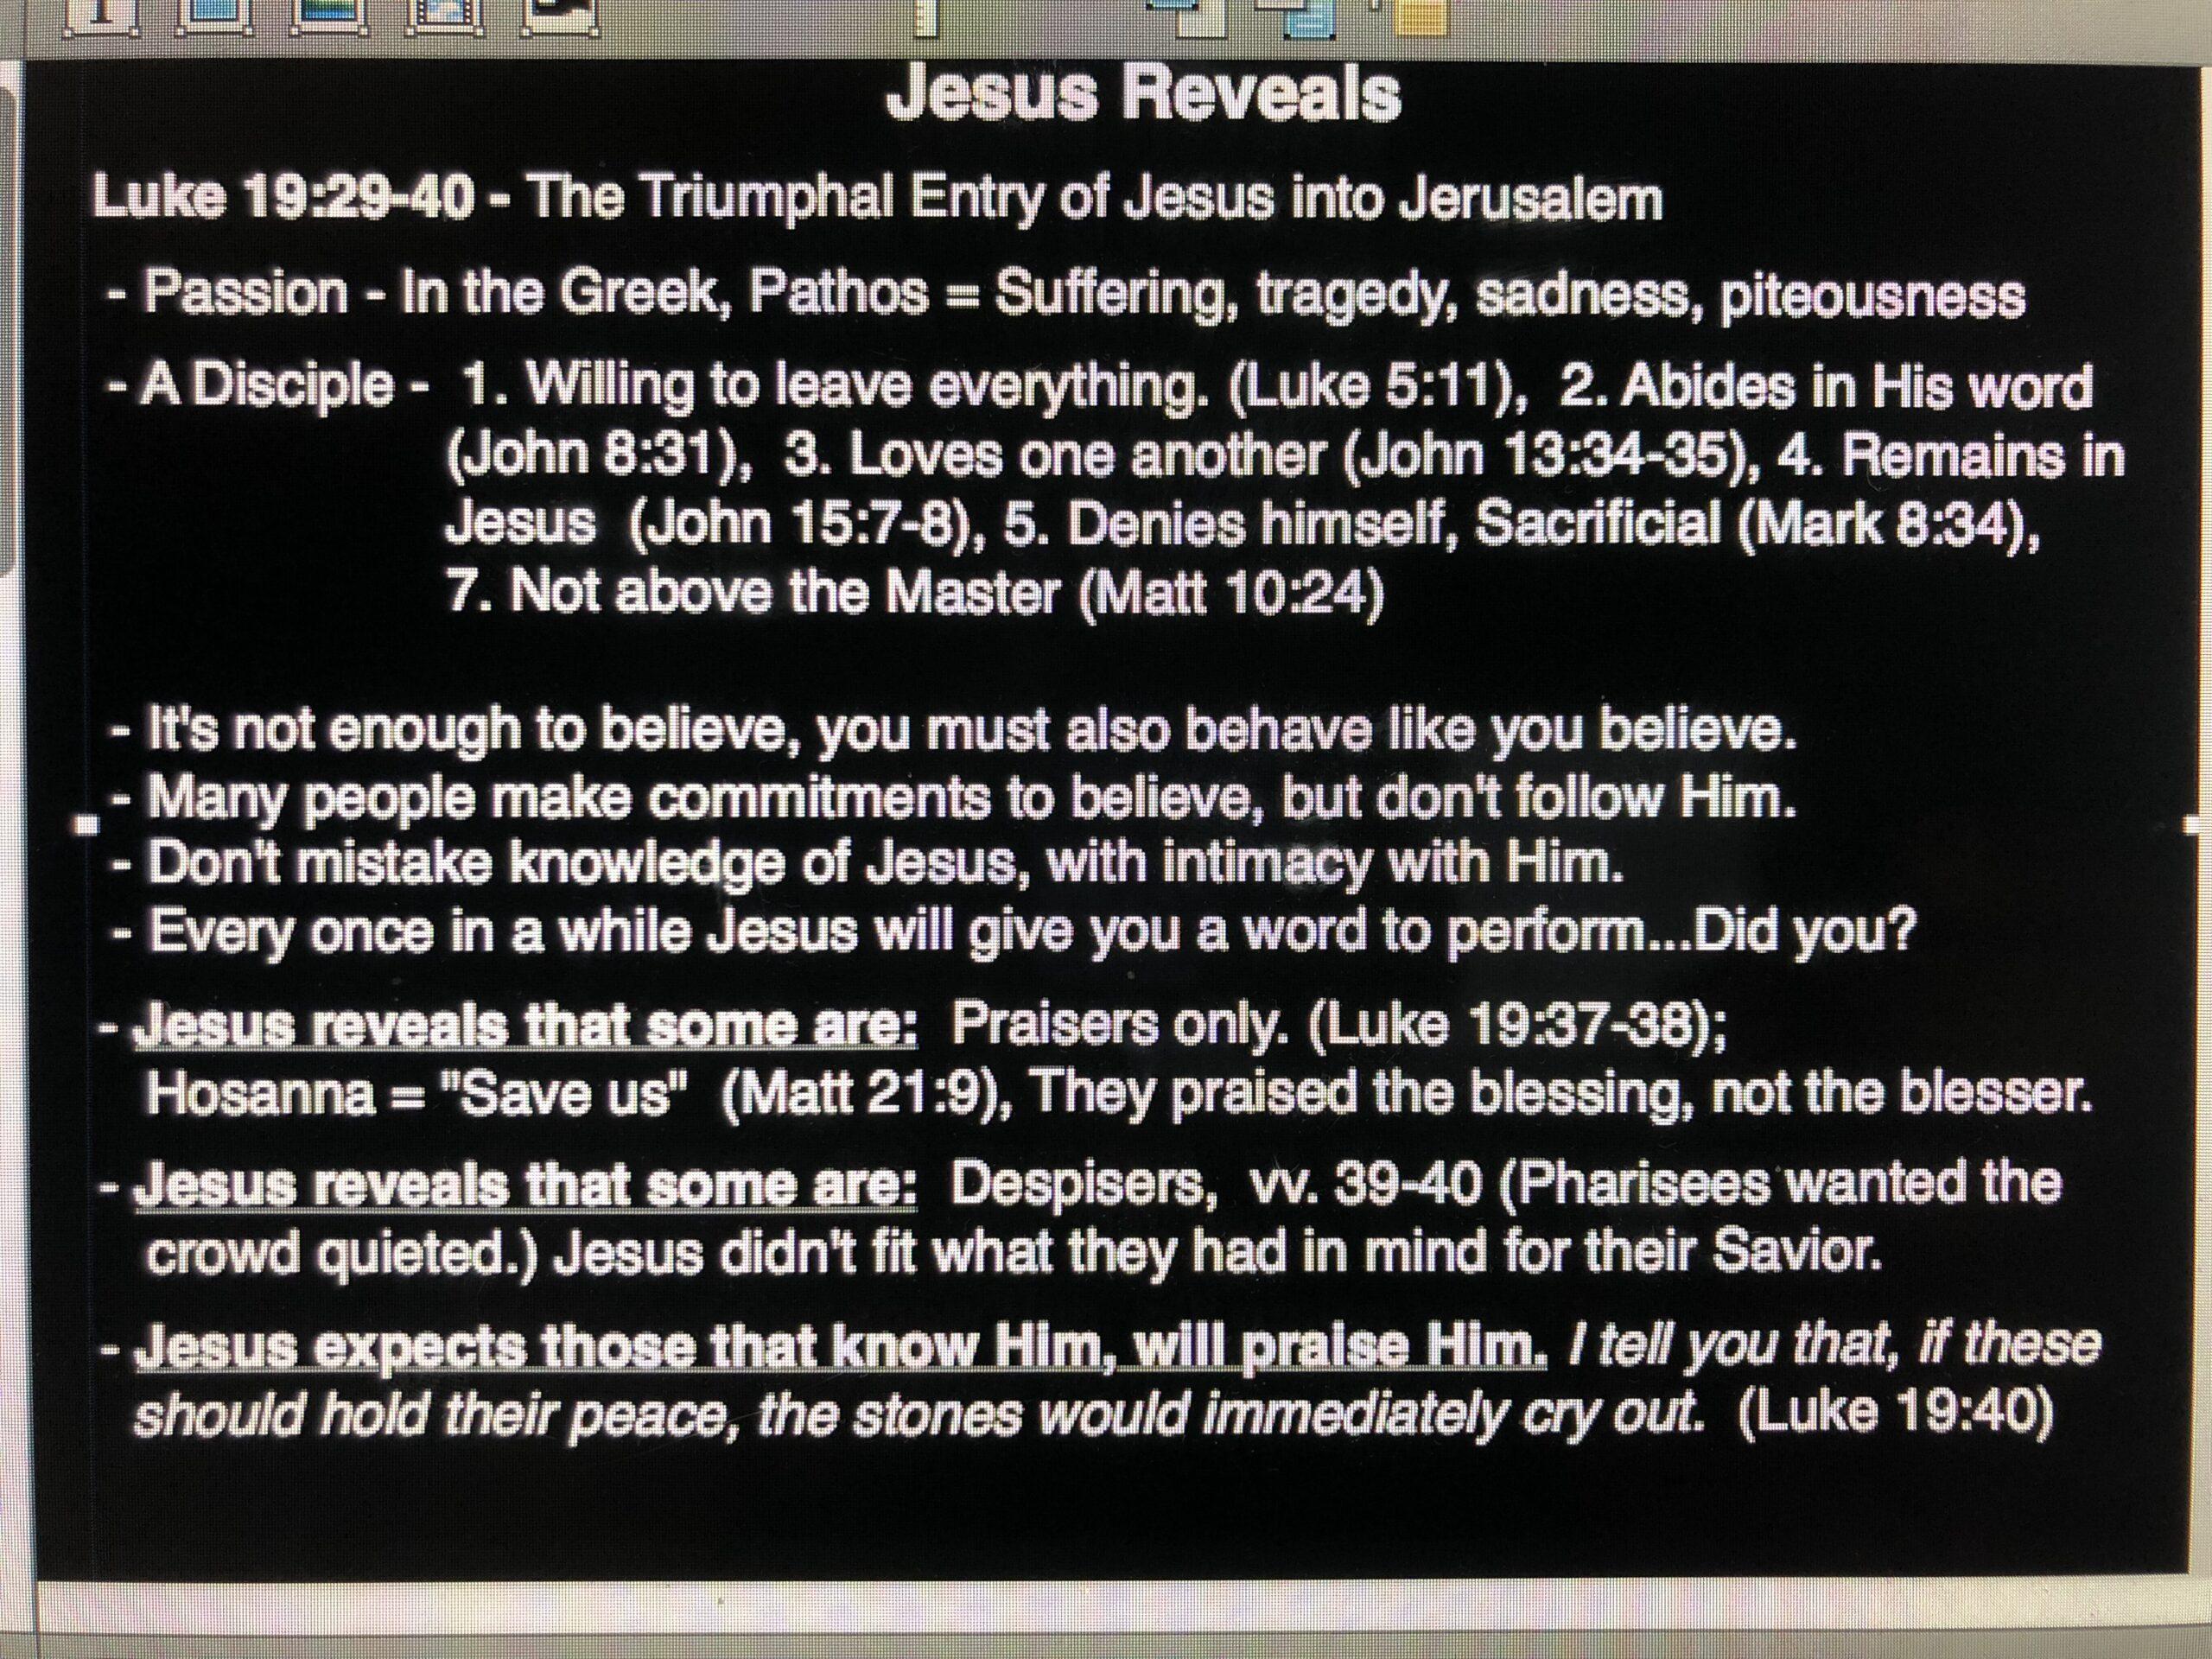 Jesus Reveals - April 14, 2019